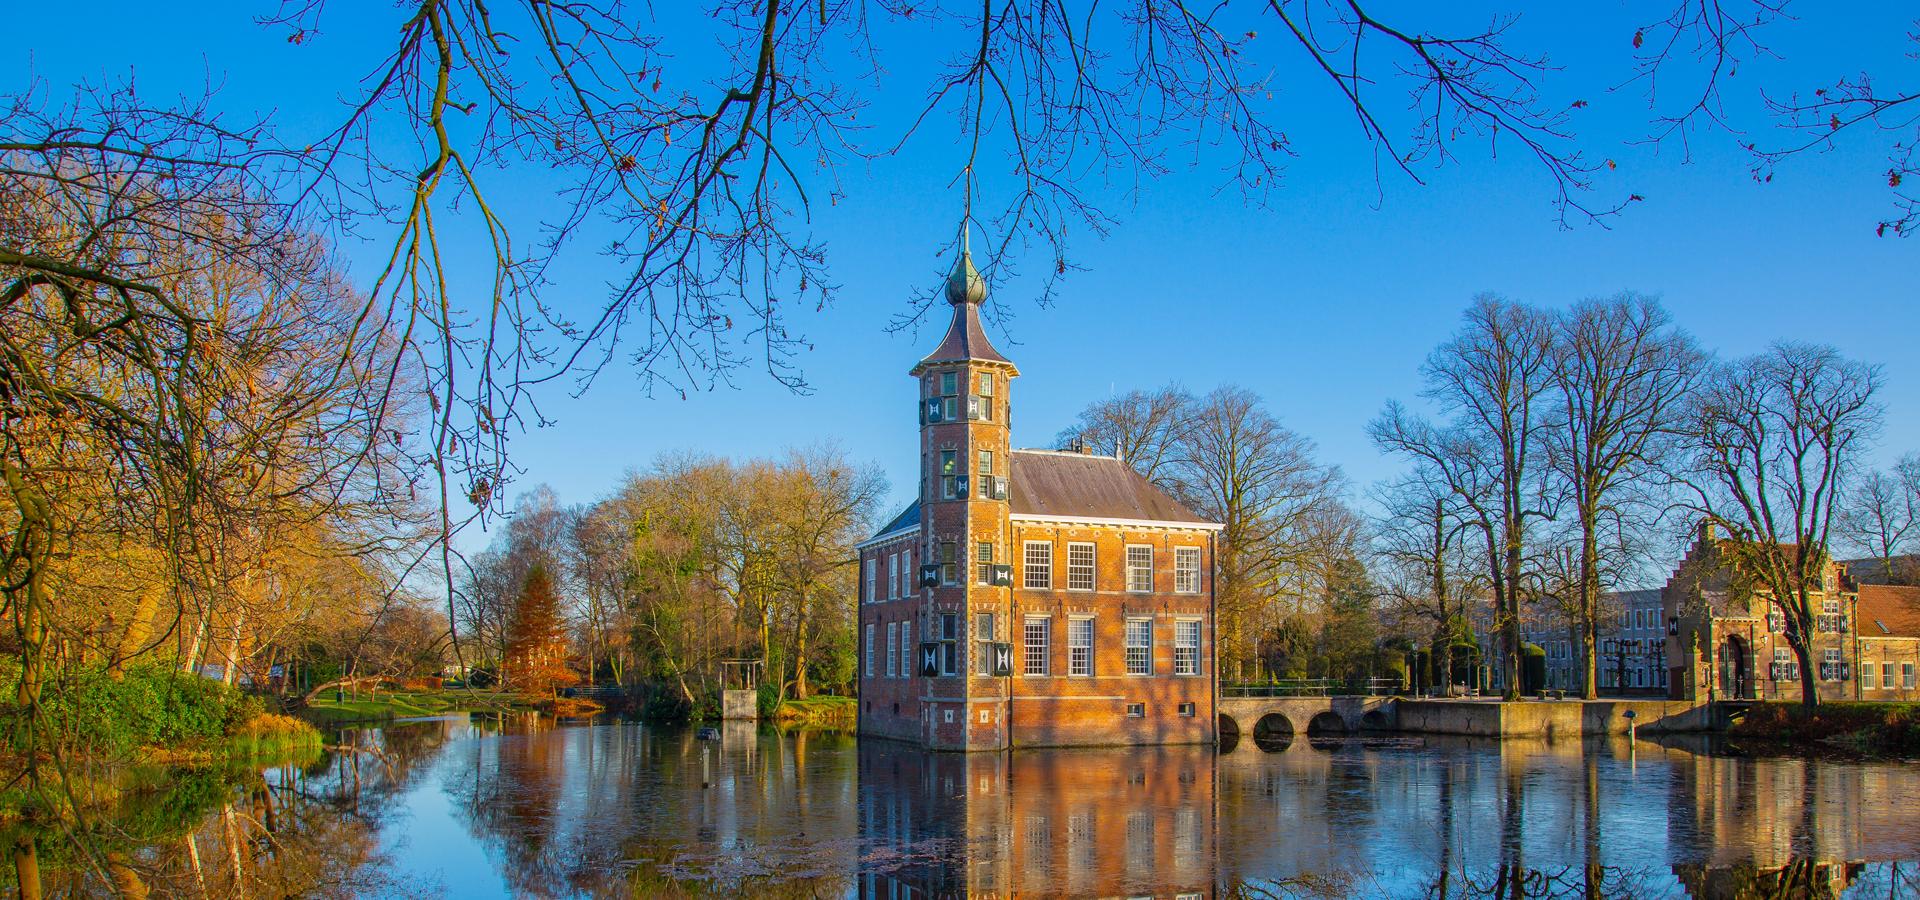 Peer-to-peer advisory in Breda, North Brabant, Netherlands